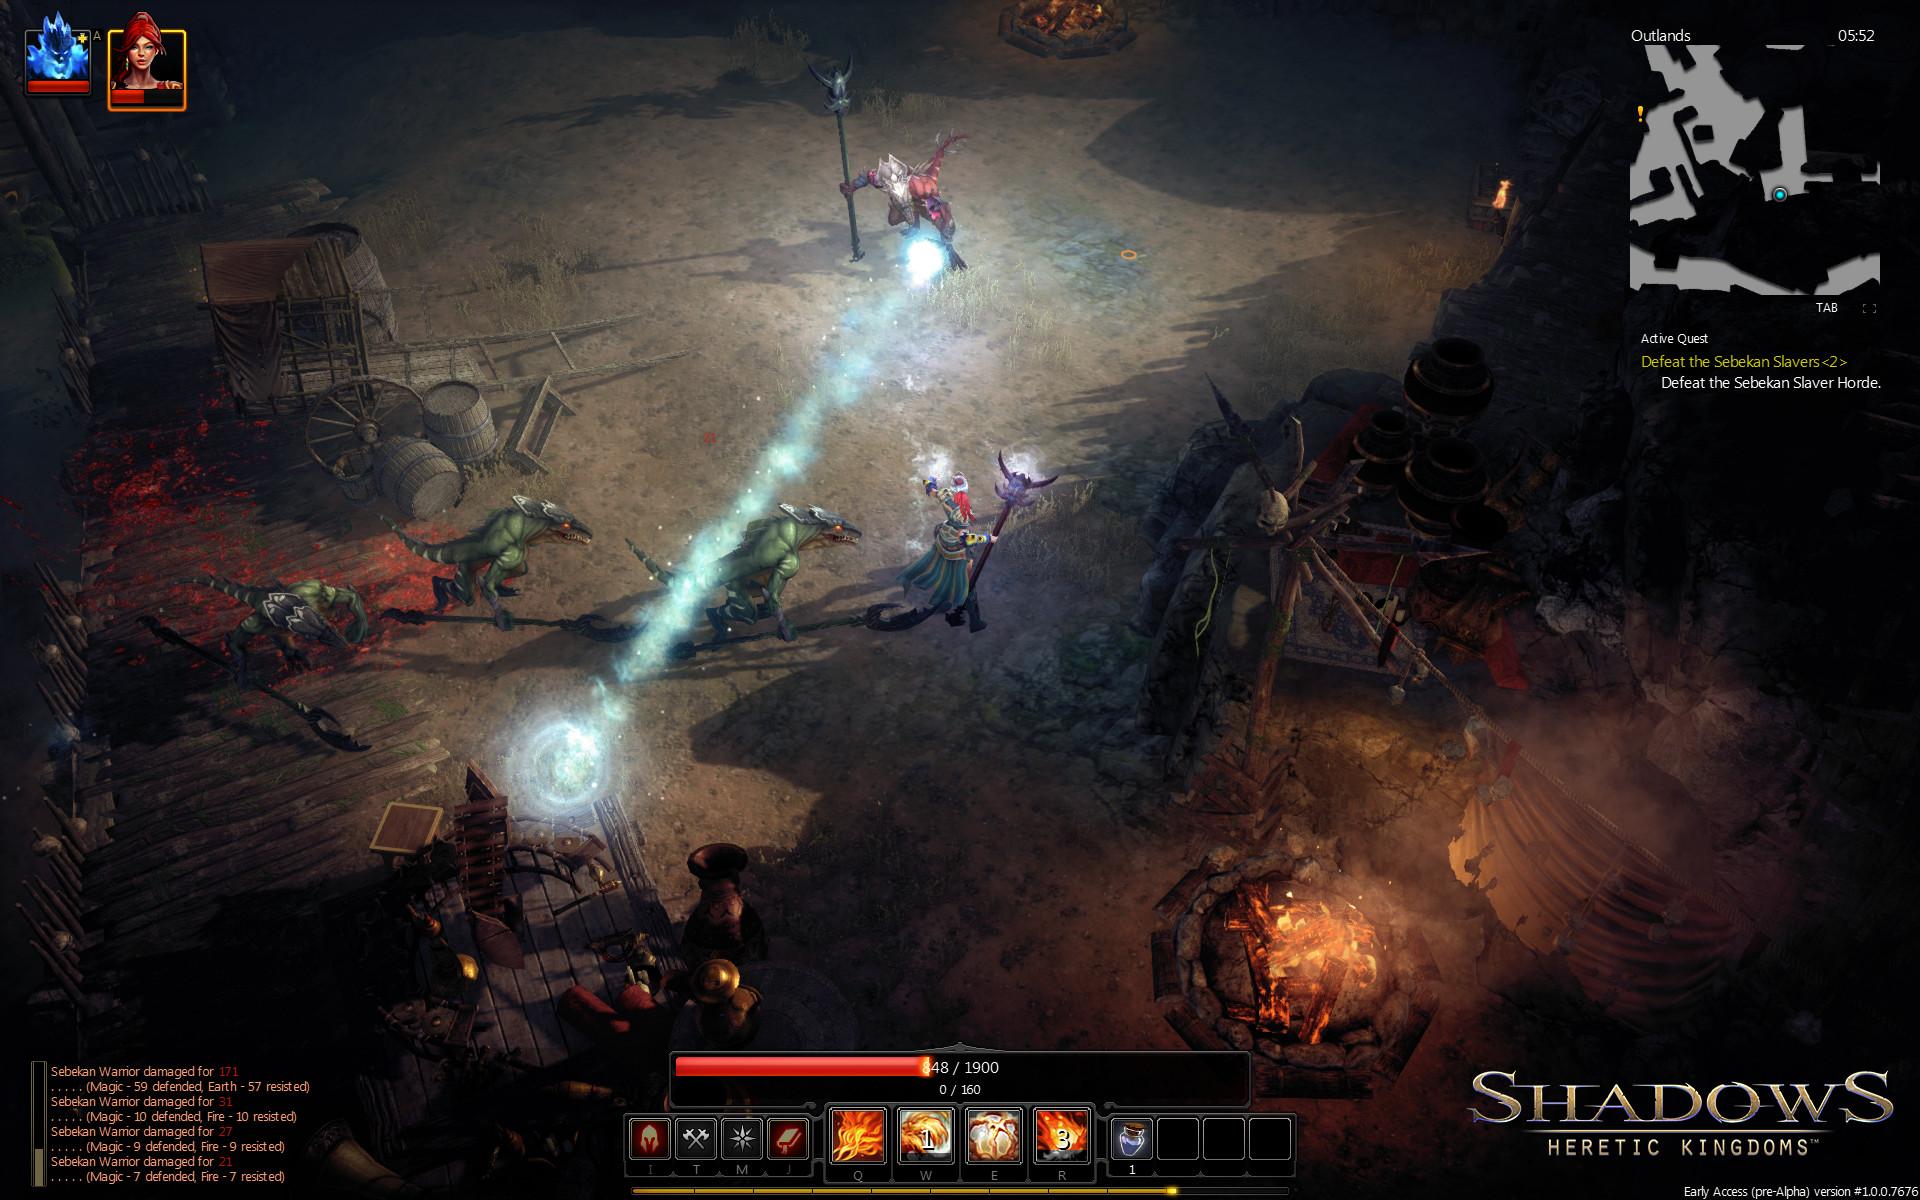 Shadows: Heretic Kingdoms screenshot